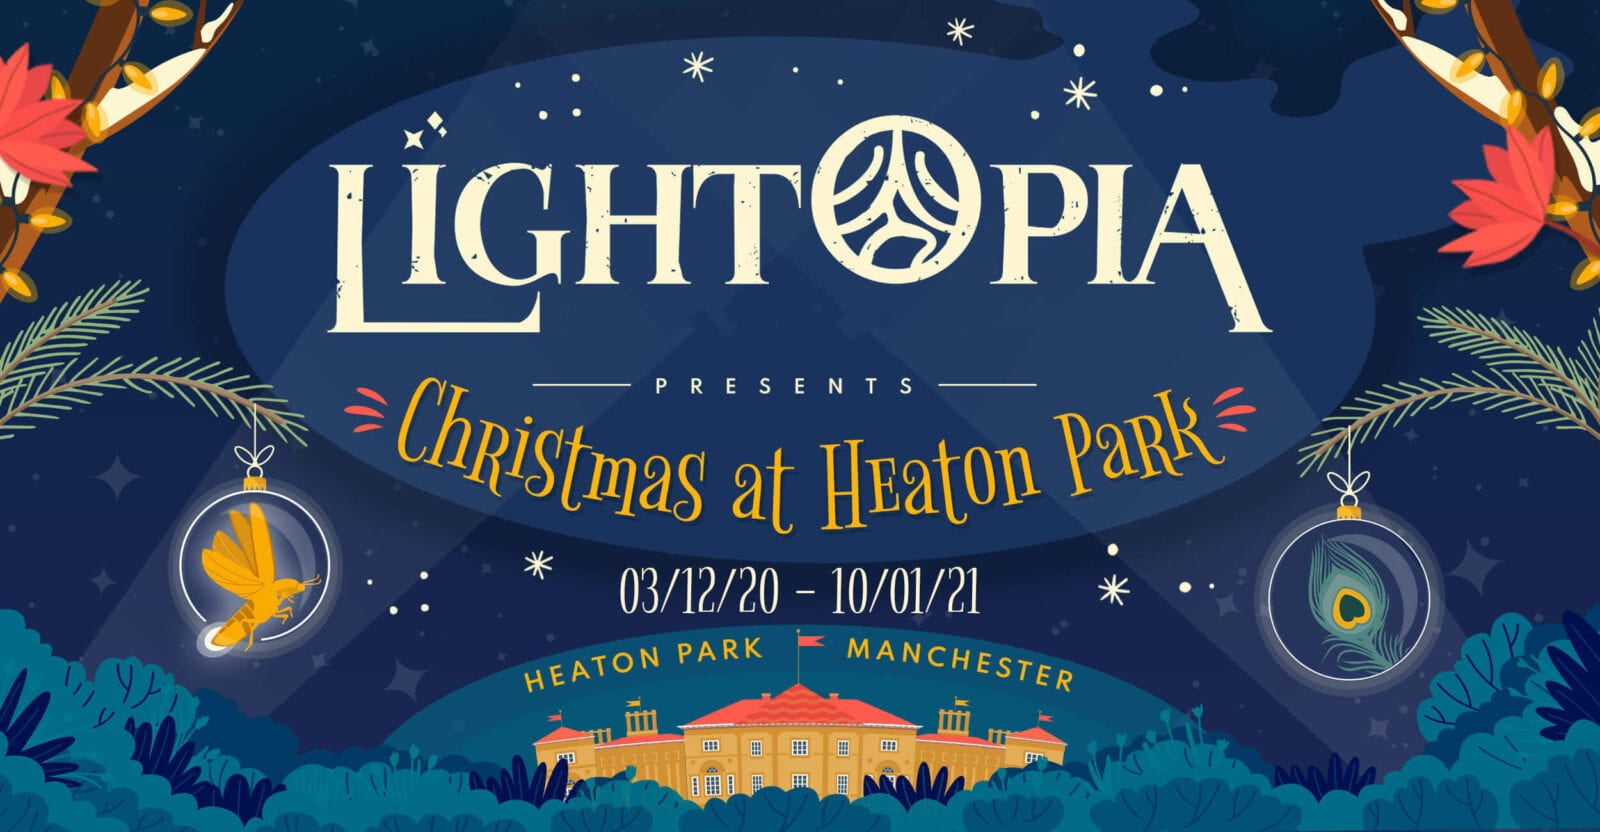 Lightopia will still go ahead in Heaton Park under Tier 3 restrictions next month, The Manc